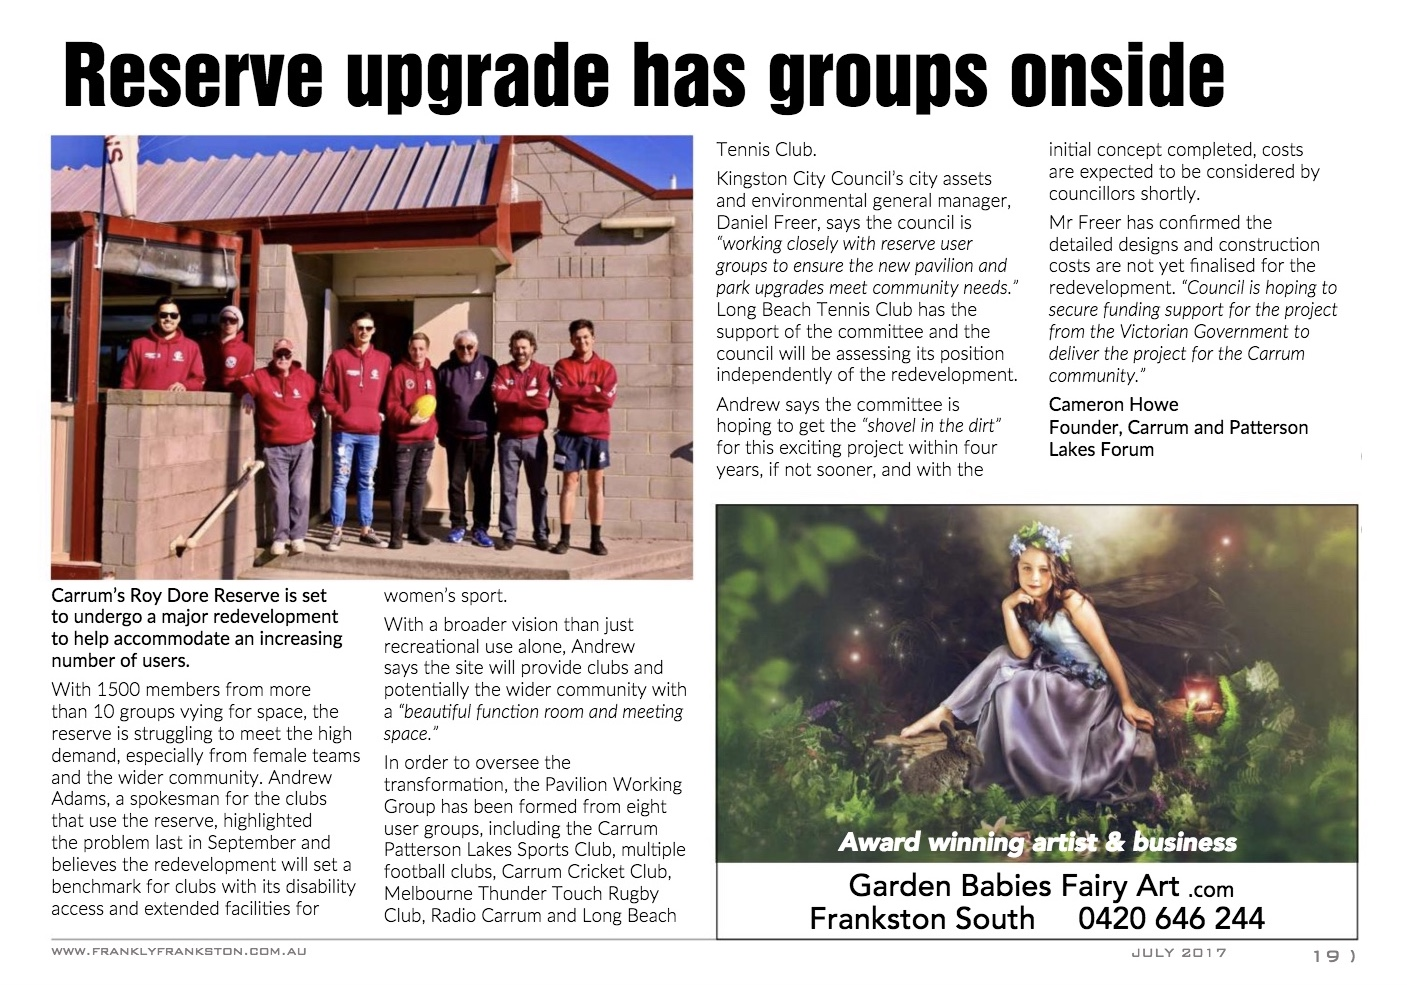 Roy Dore Reserve story, Frankly Frankston Magazine